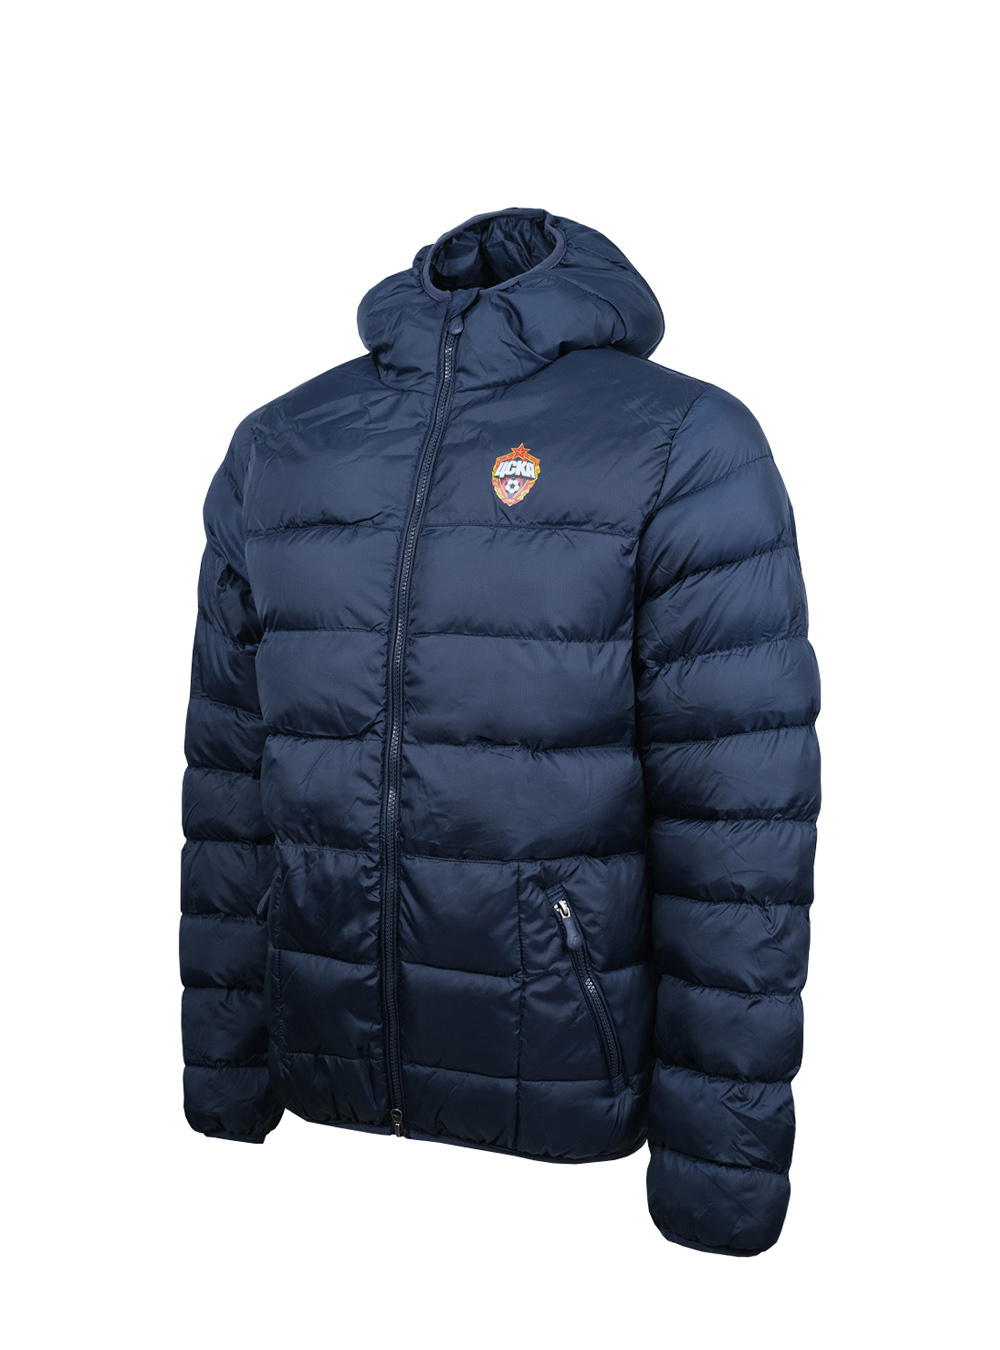 Купить Куртка утеплённая, цвет тёмно-синий (XXL) по Нижнему Новгороду